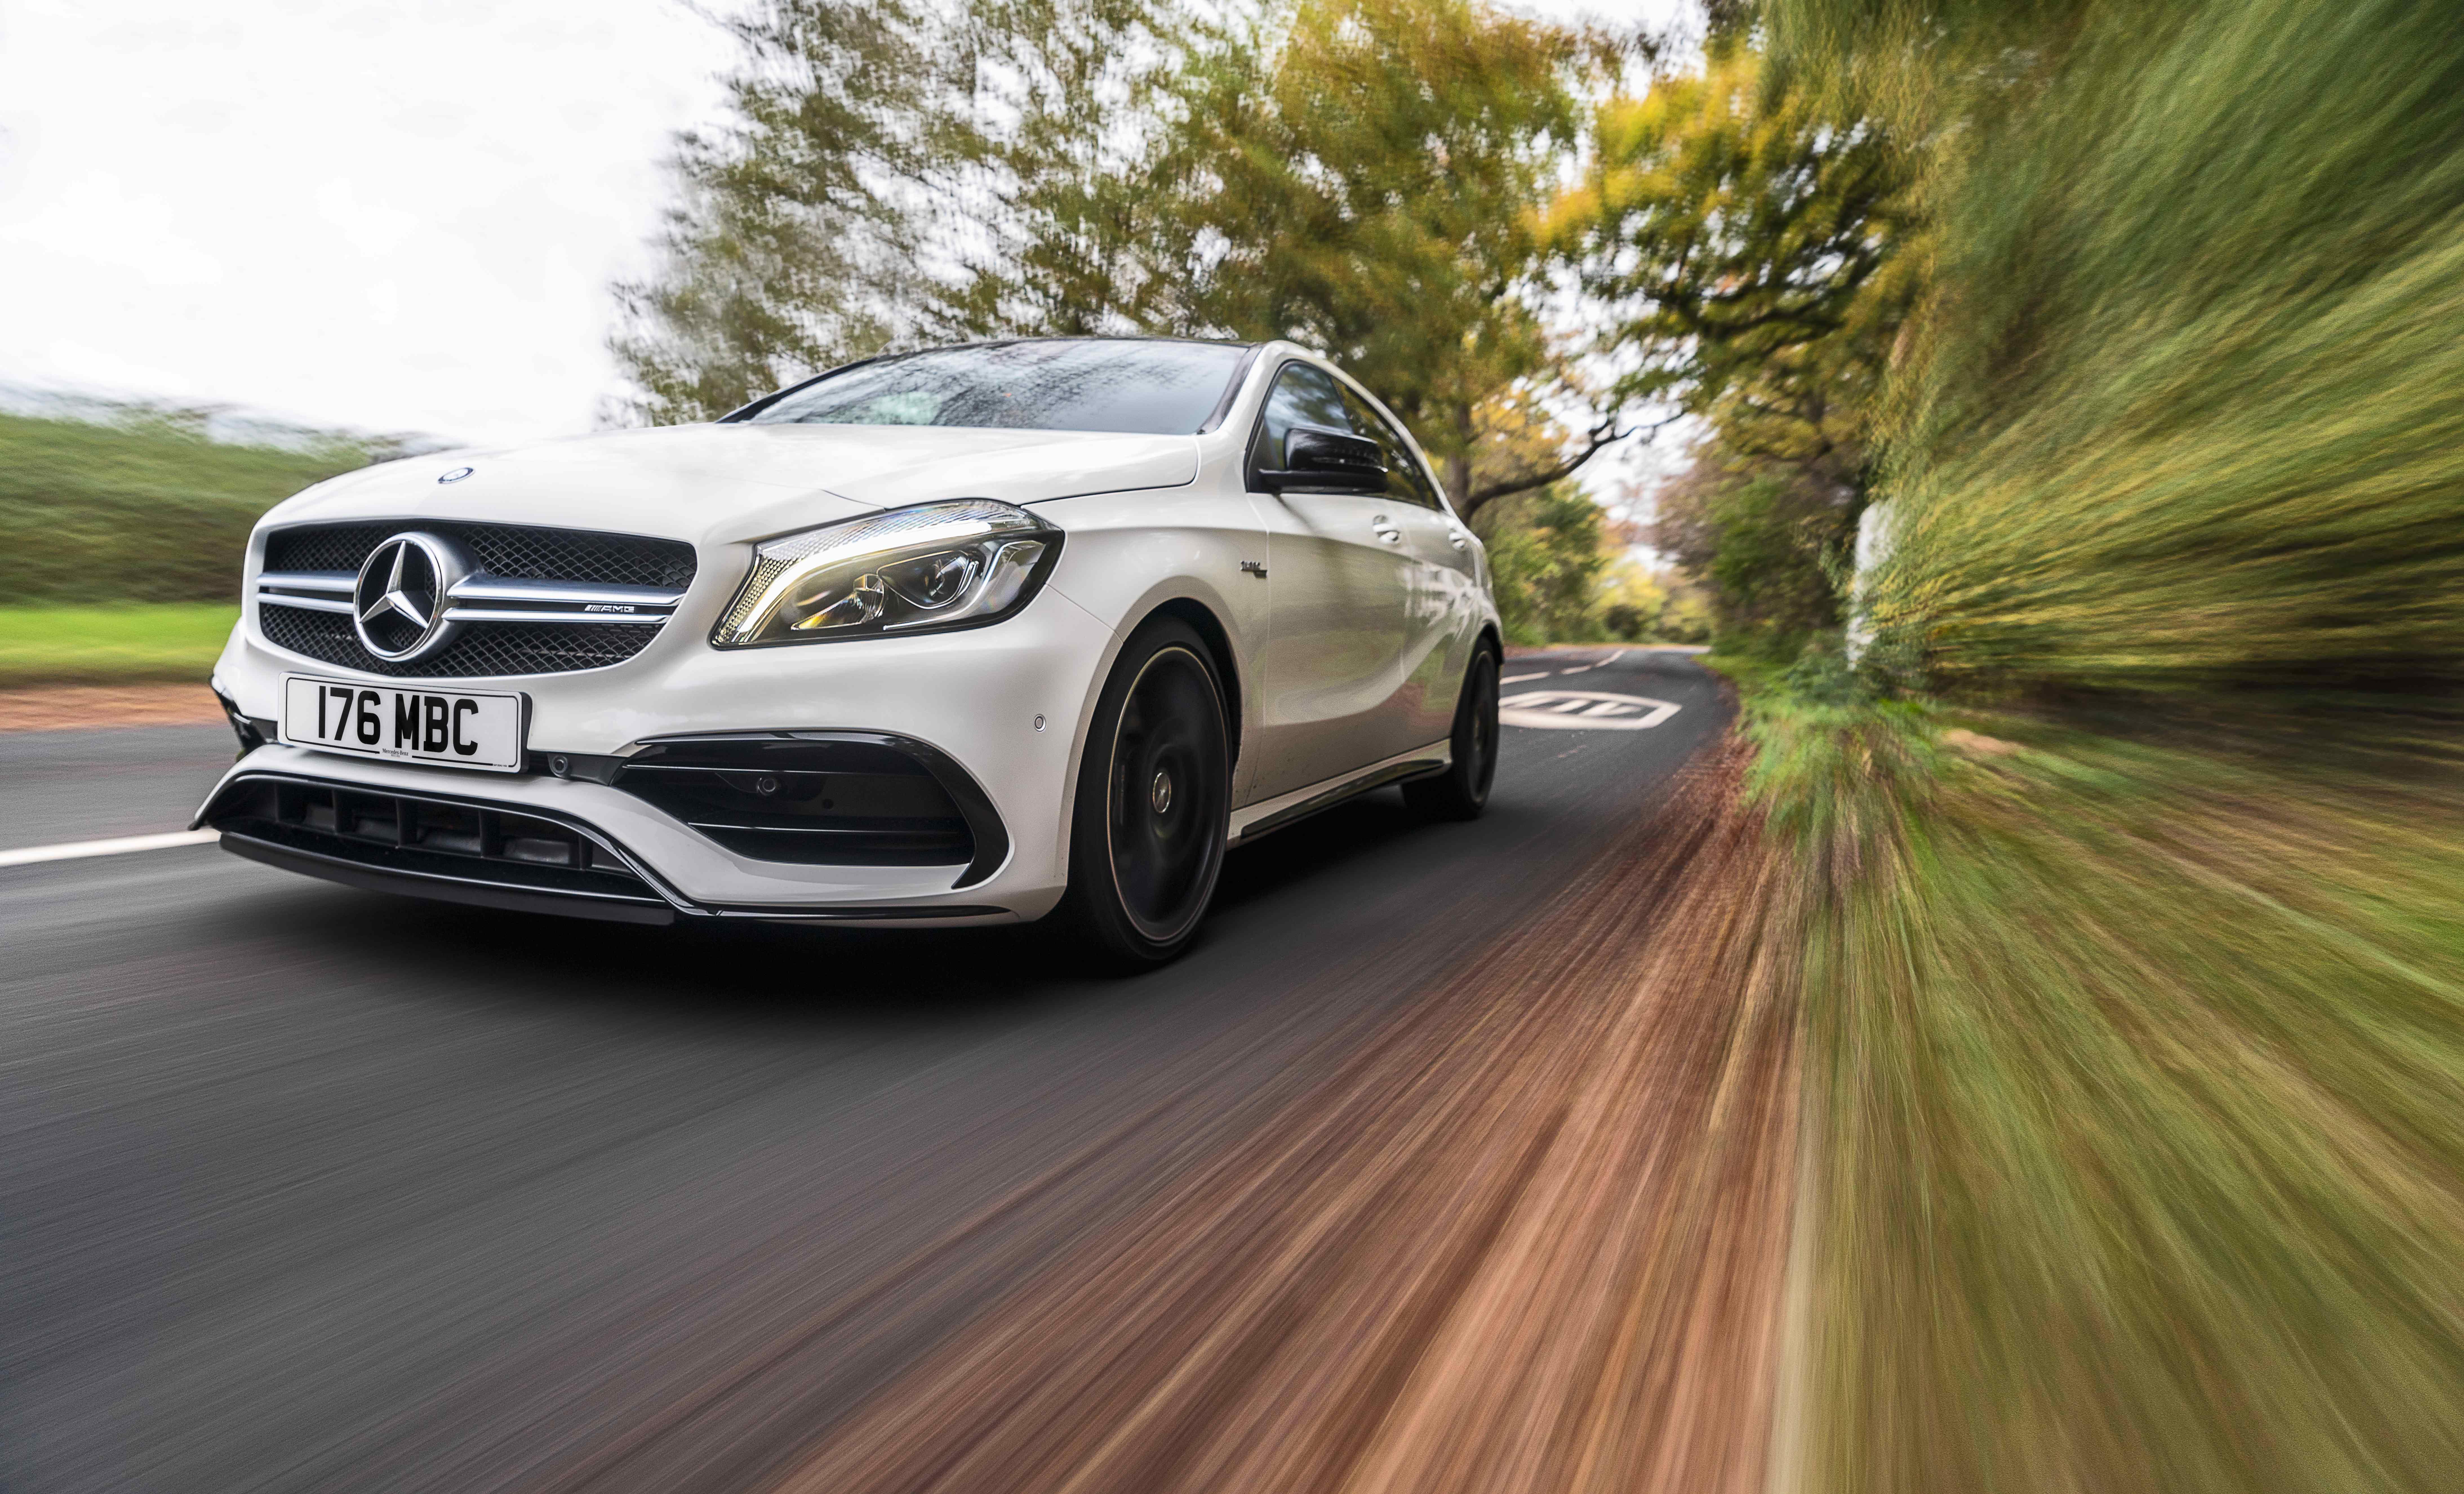 Mercedes benz wants australia to drop its luxury car tax for Mercedes benz luxury truck